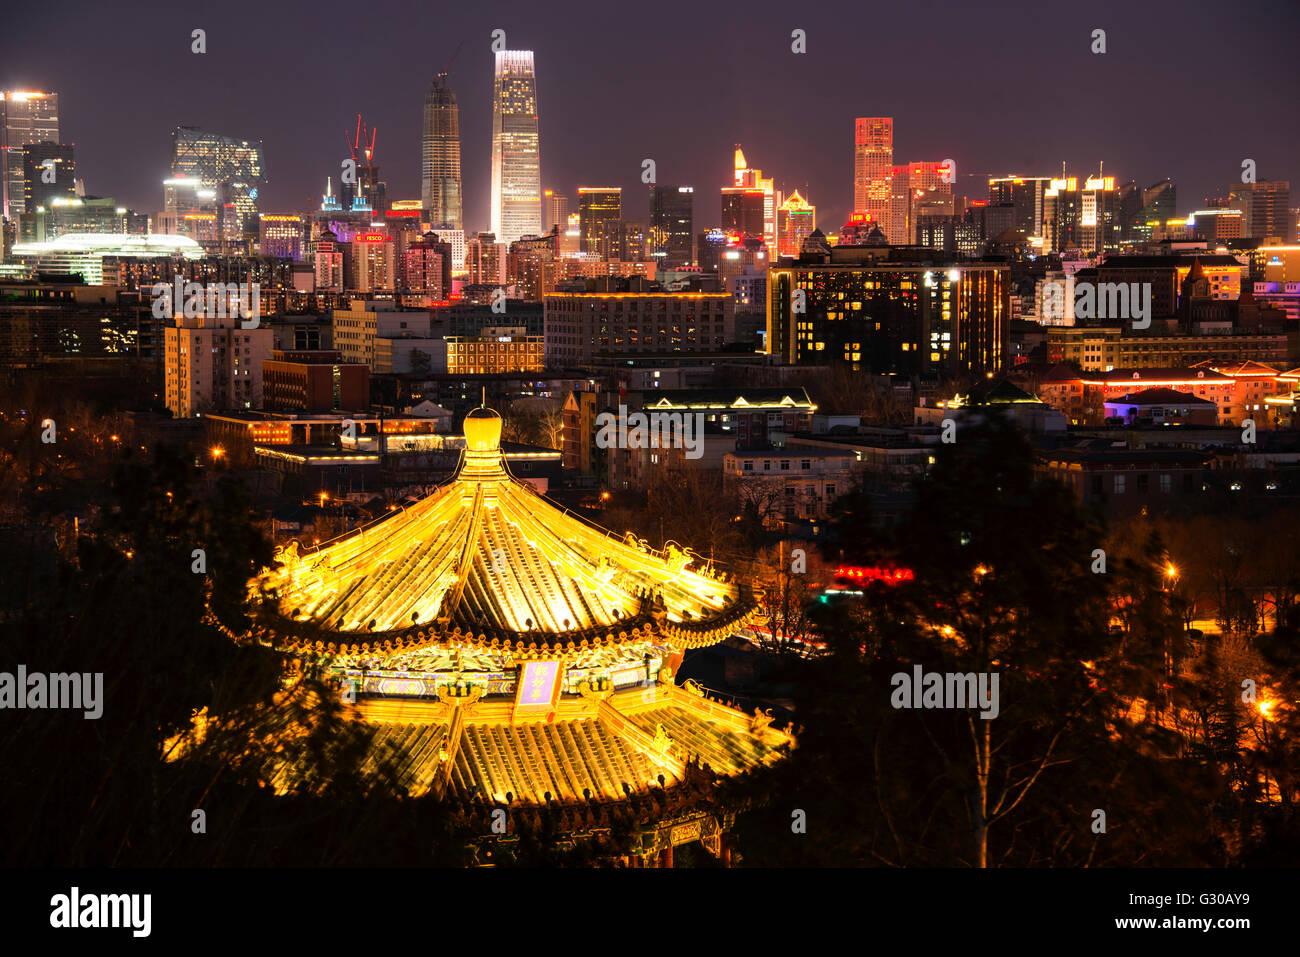 La pagode illuminée et Beijing cityscape at night, Beijing, China, Asia Photo Stock